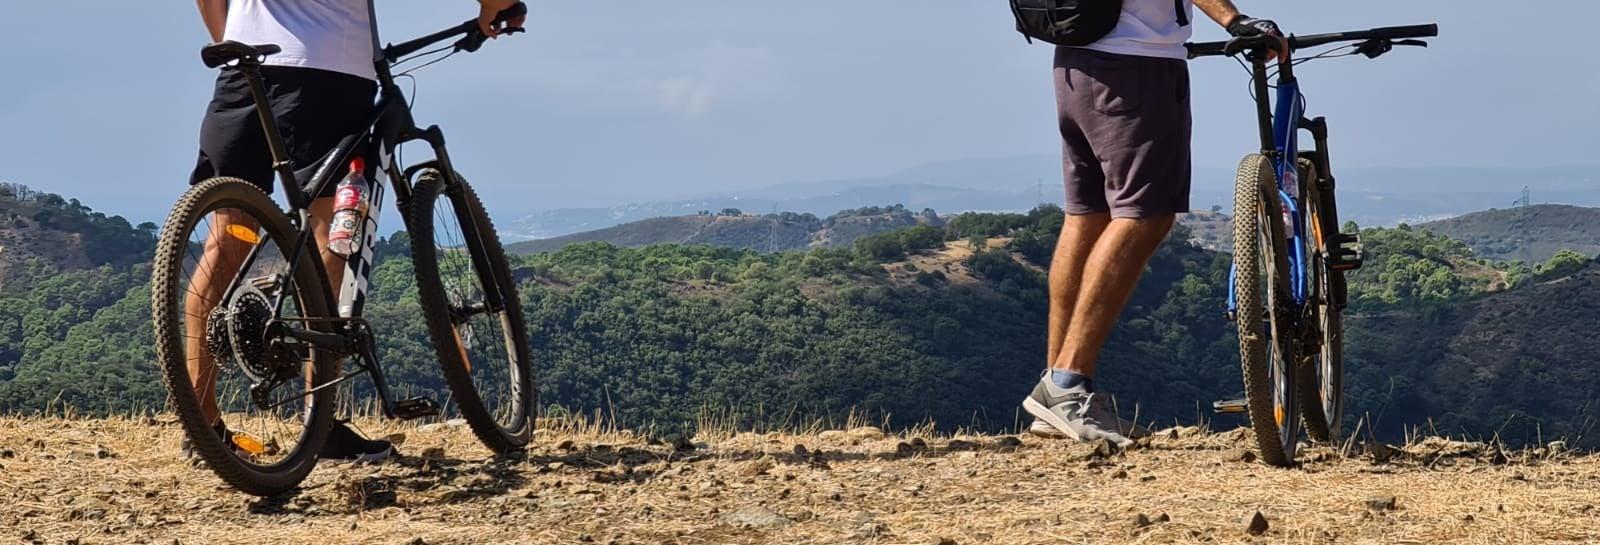 Tour en bicicleta por la Sierra Bermeja